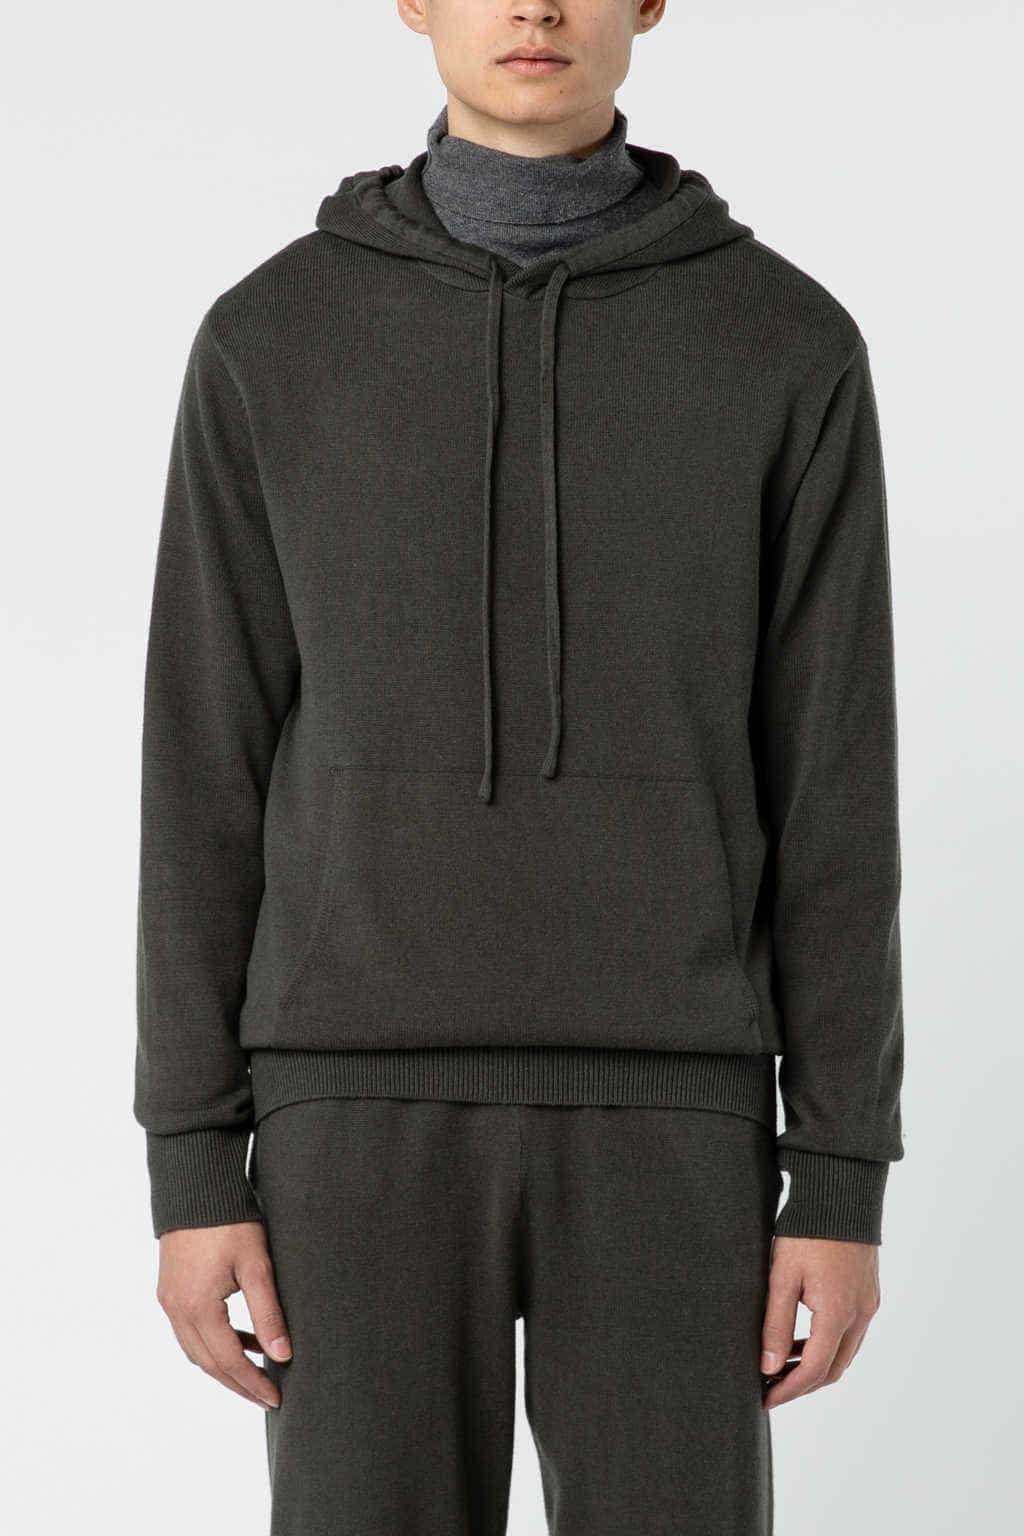 Sweater 2756 Olive 1